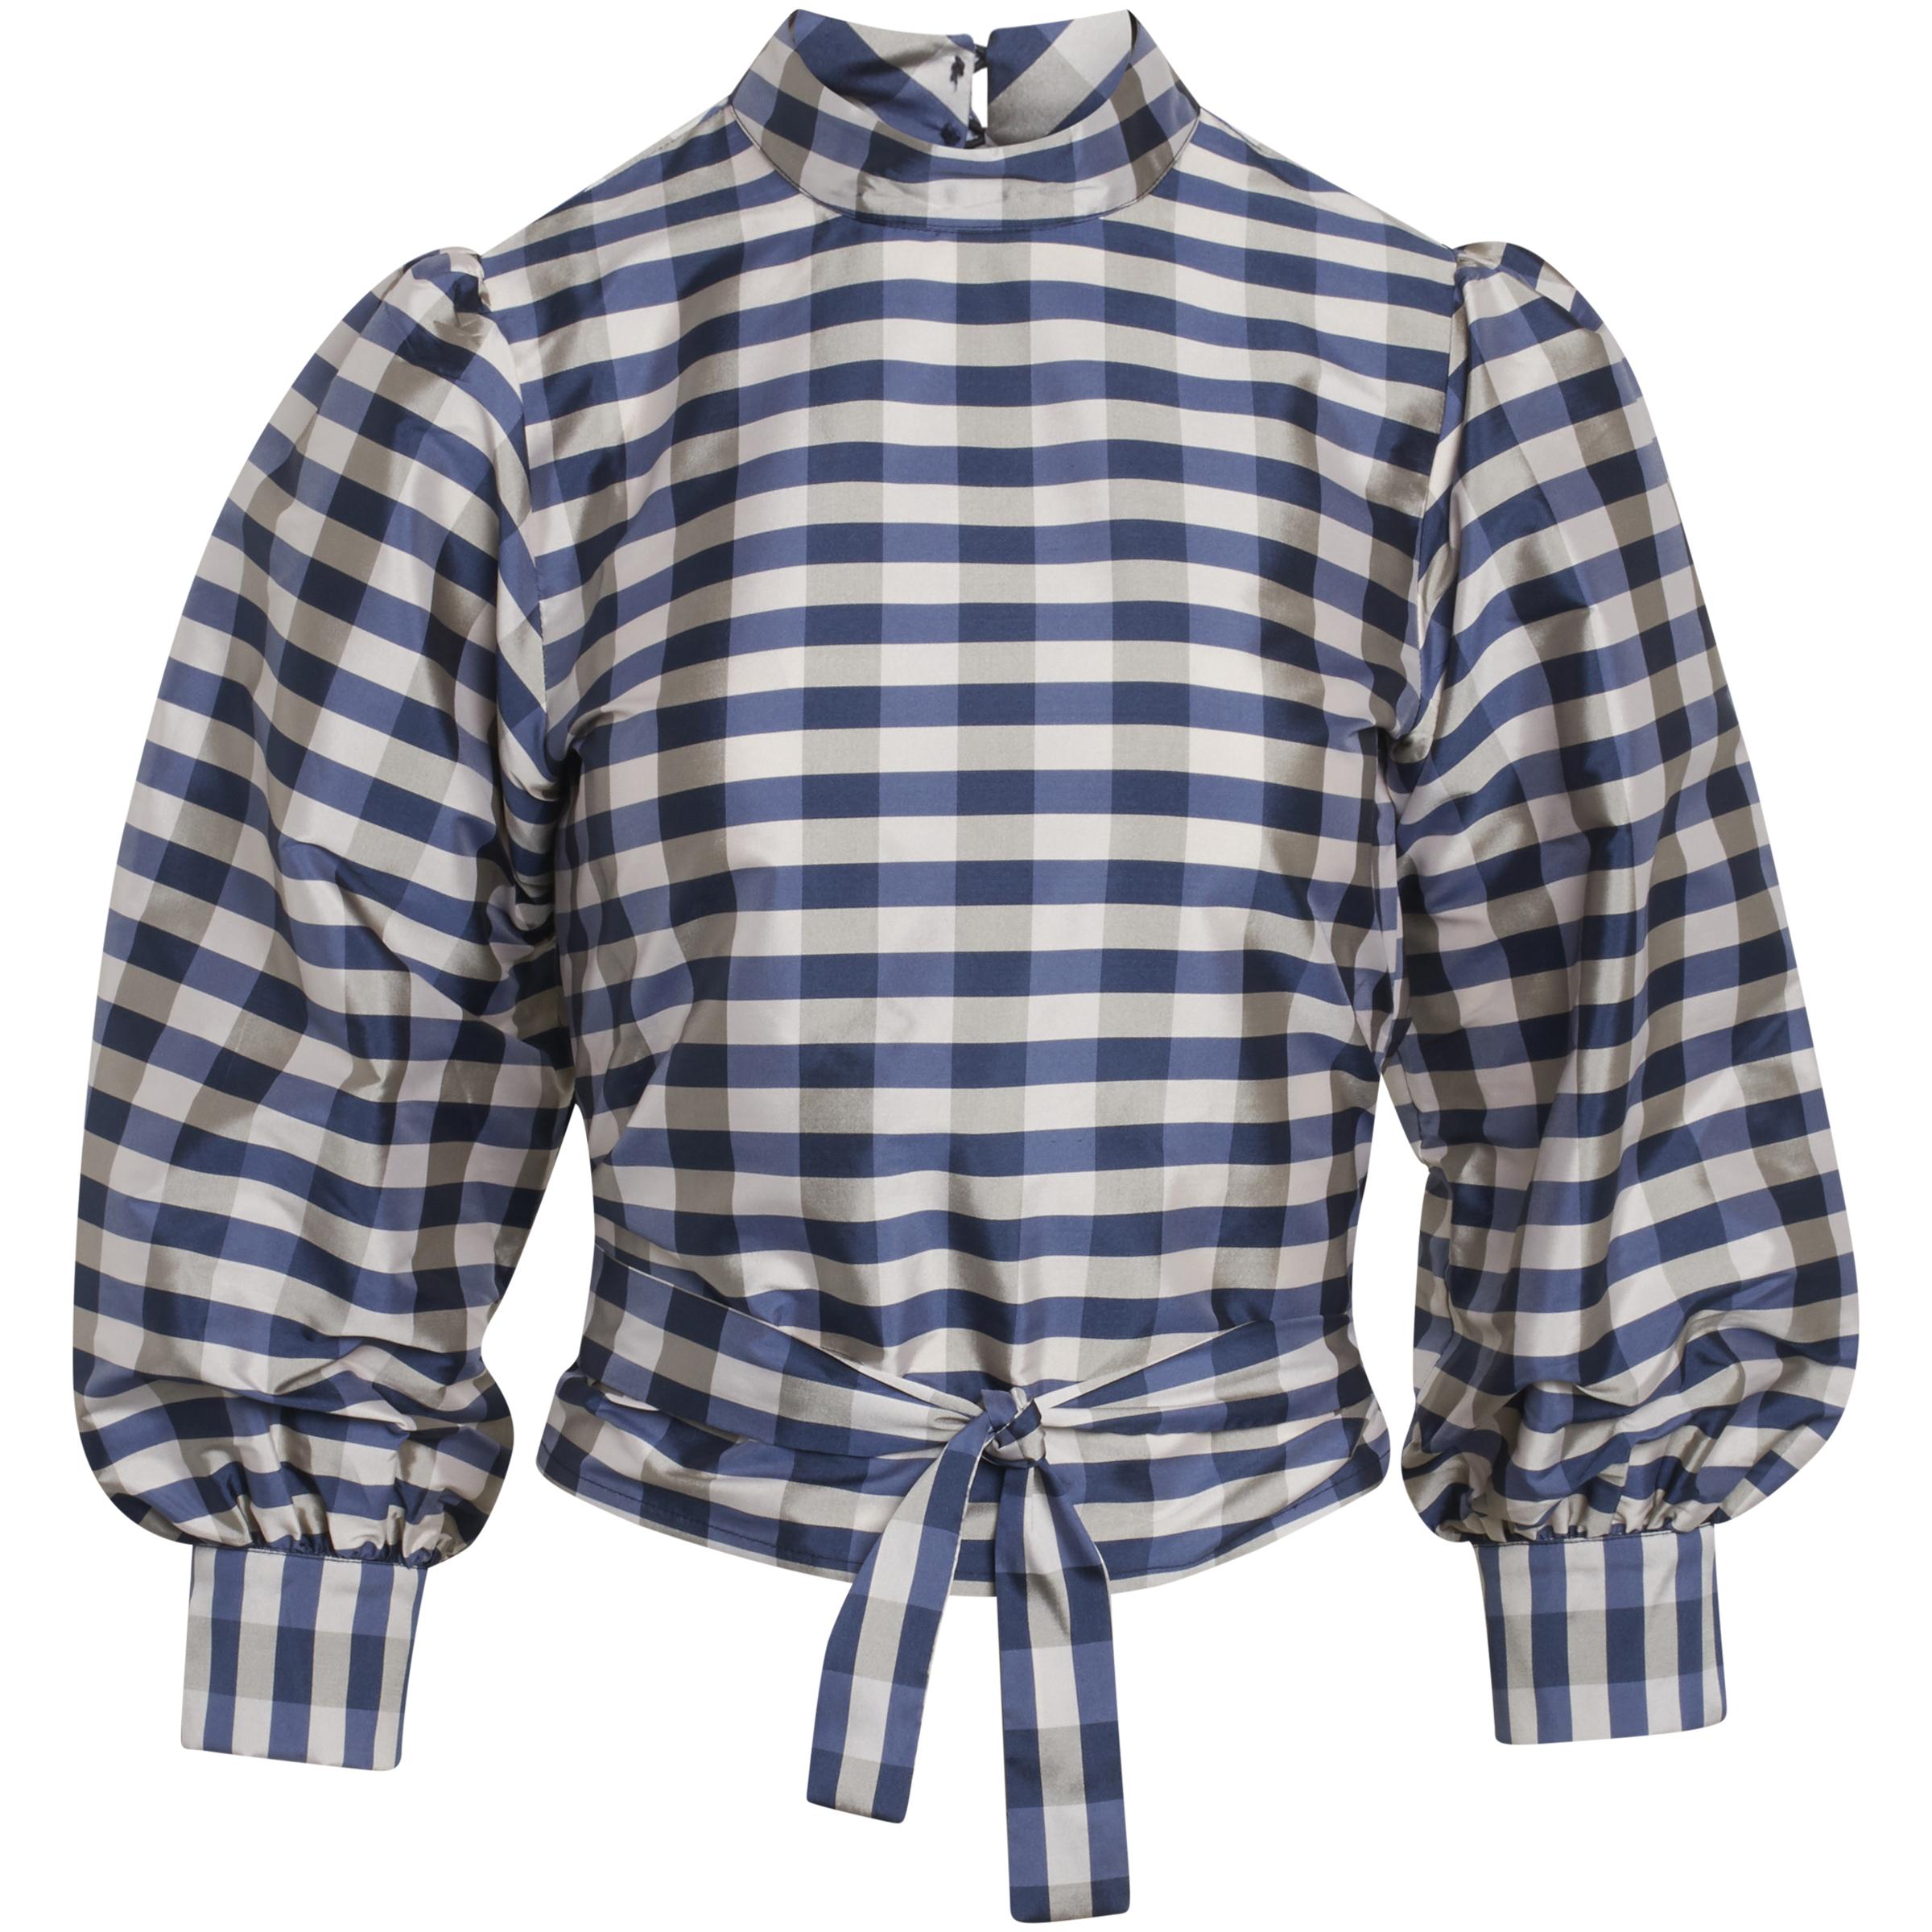 Parsley blouse